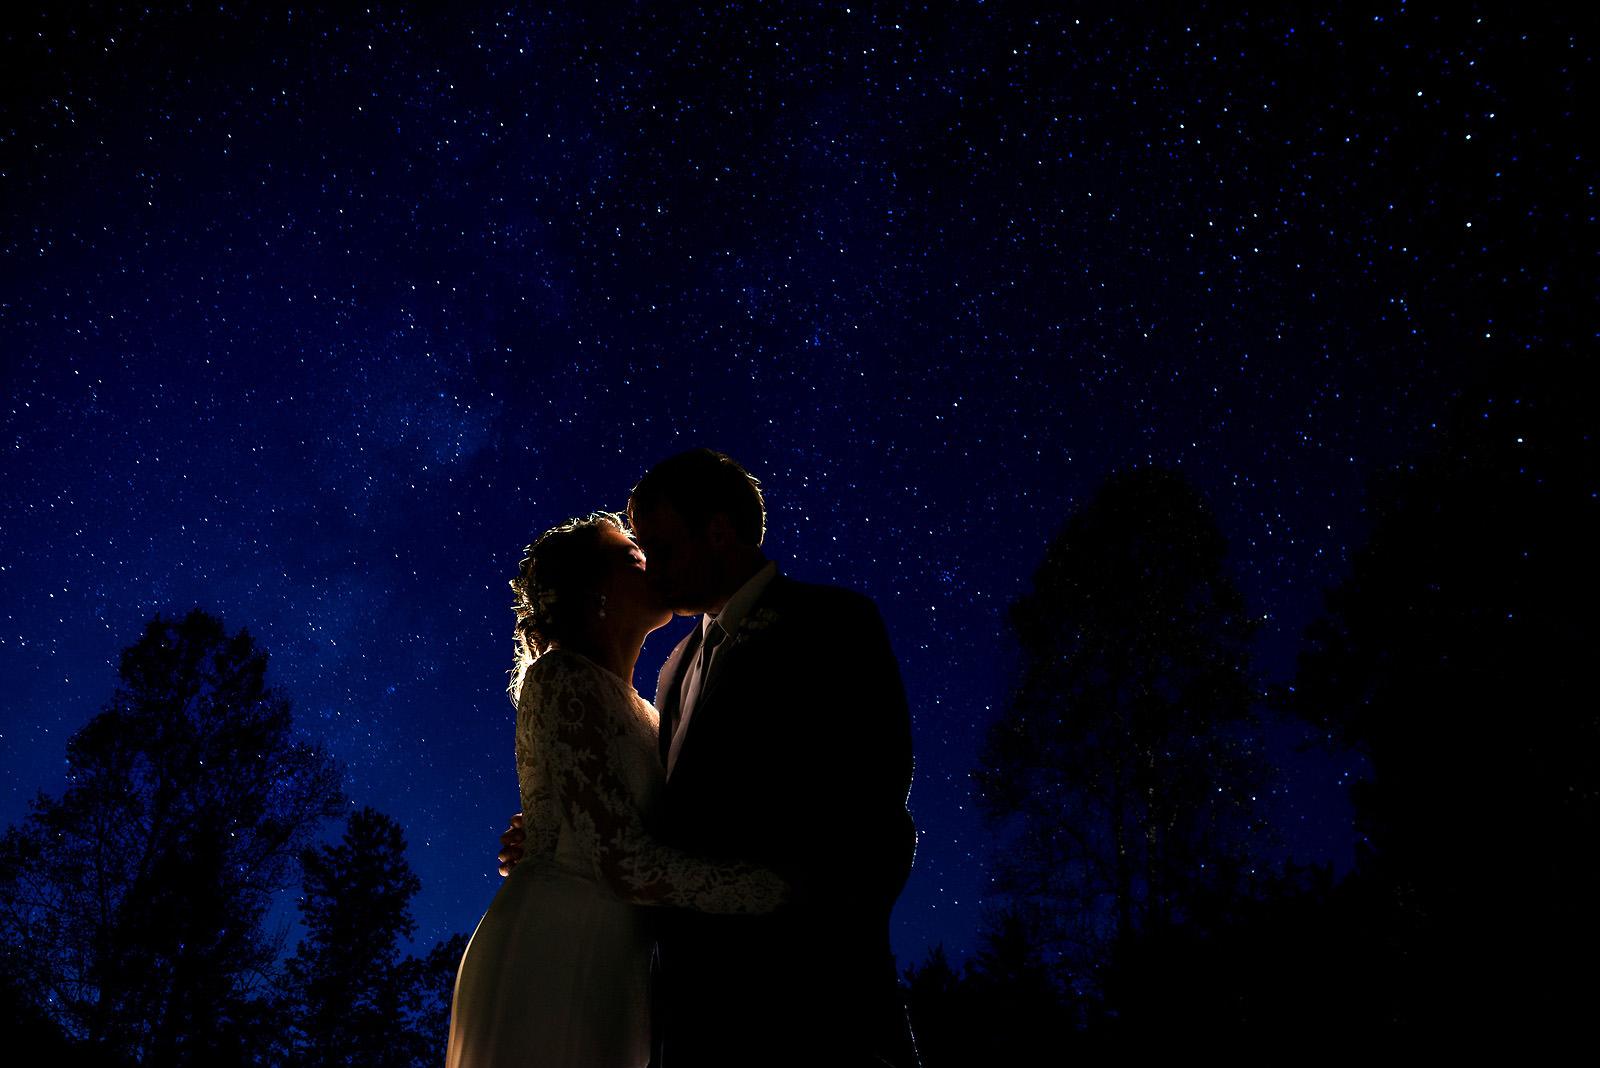 destination-wedding-photographer-star-night-portrait